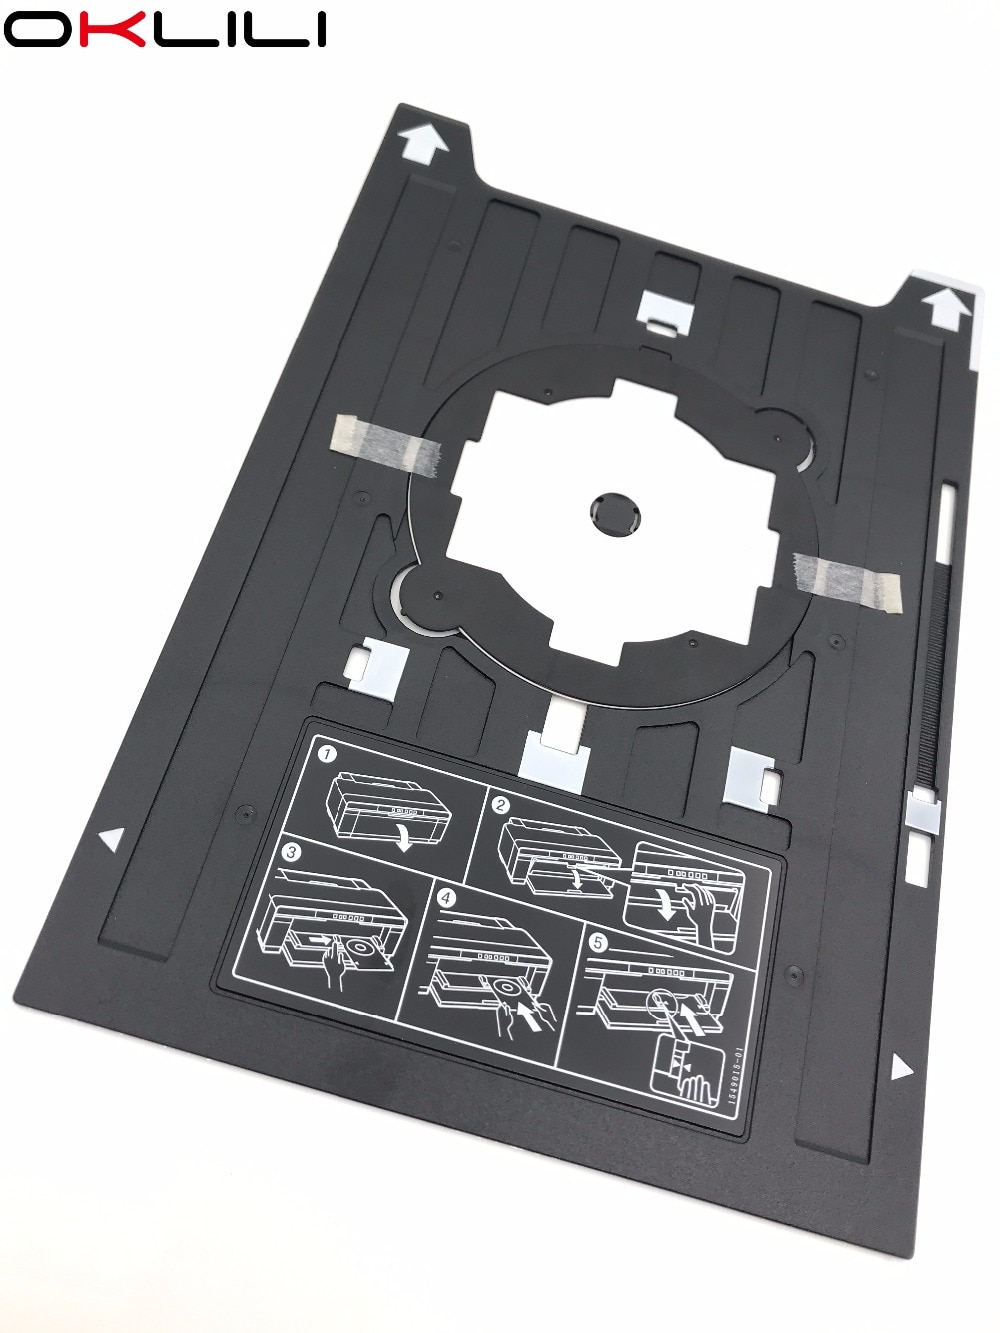 1PCX Print CD DVD VCD tray holder Disc Bracket for Epson 1400 1410 1430 1430W 1500W R800 R1800 R1900 R2000 R2880 R3000 P400 P600